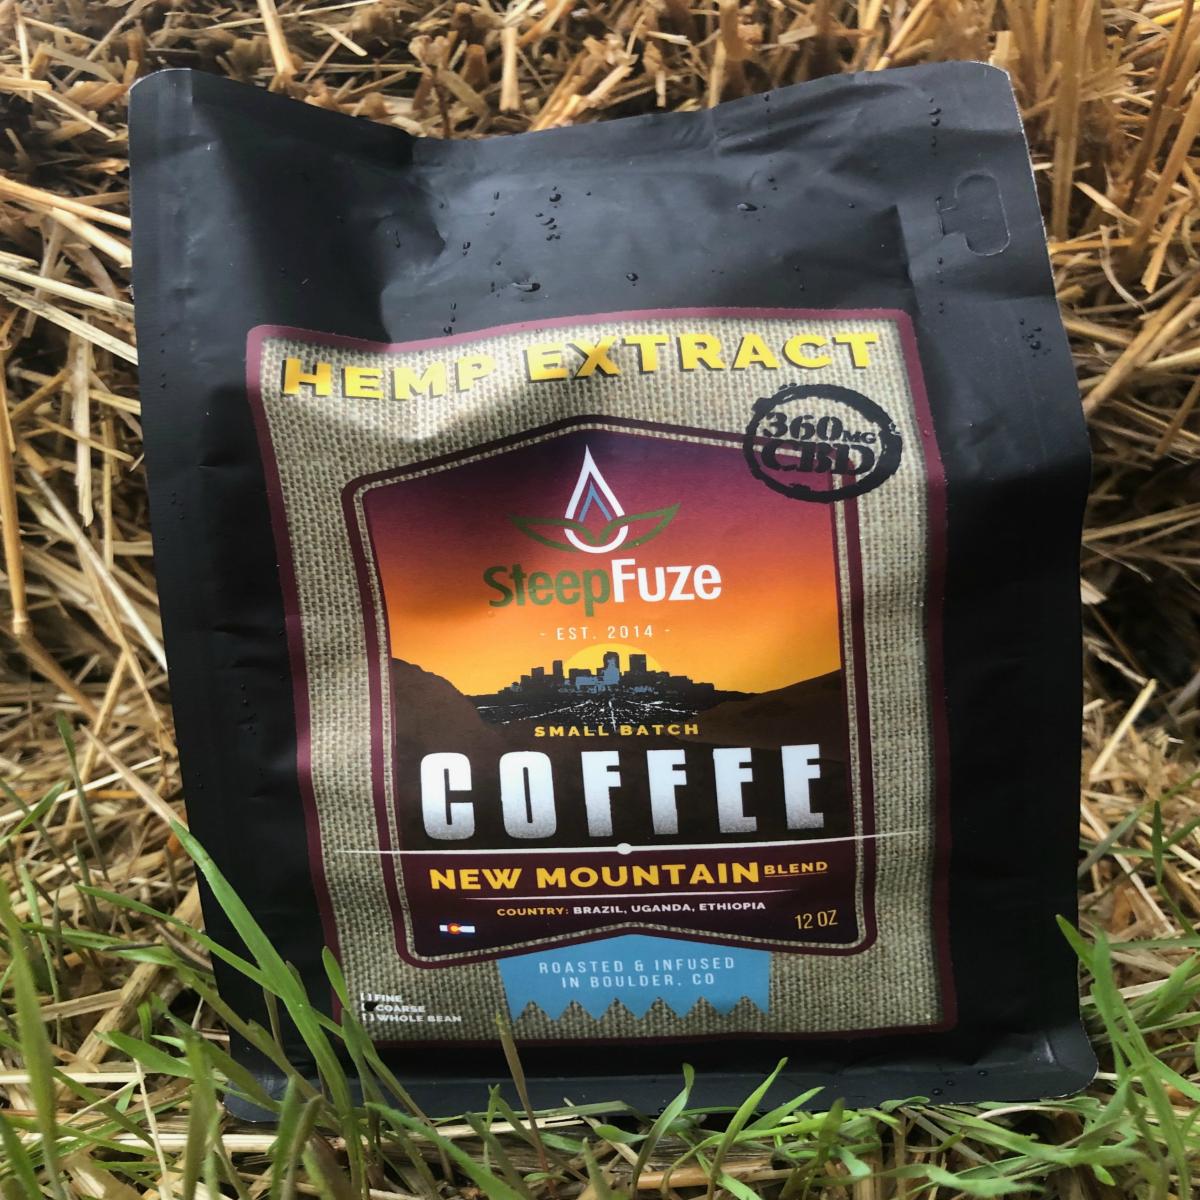 Steep Fuze CBD Coffee New Mountain